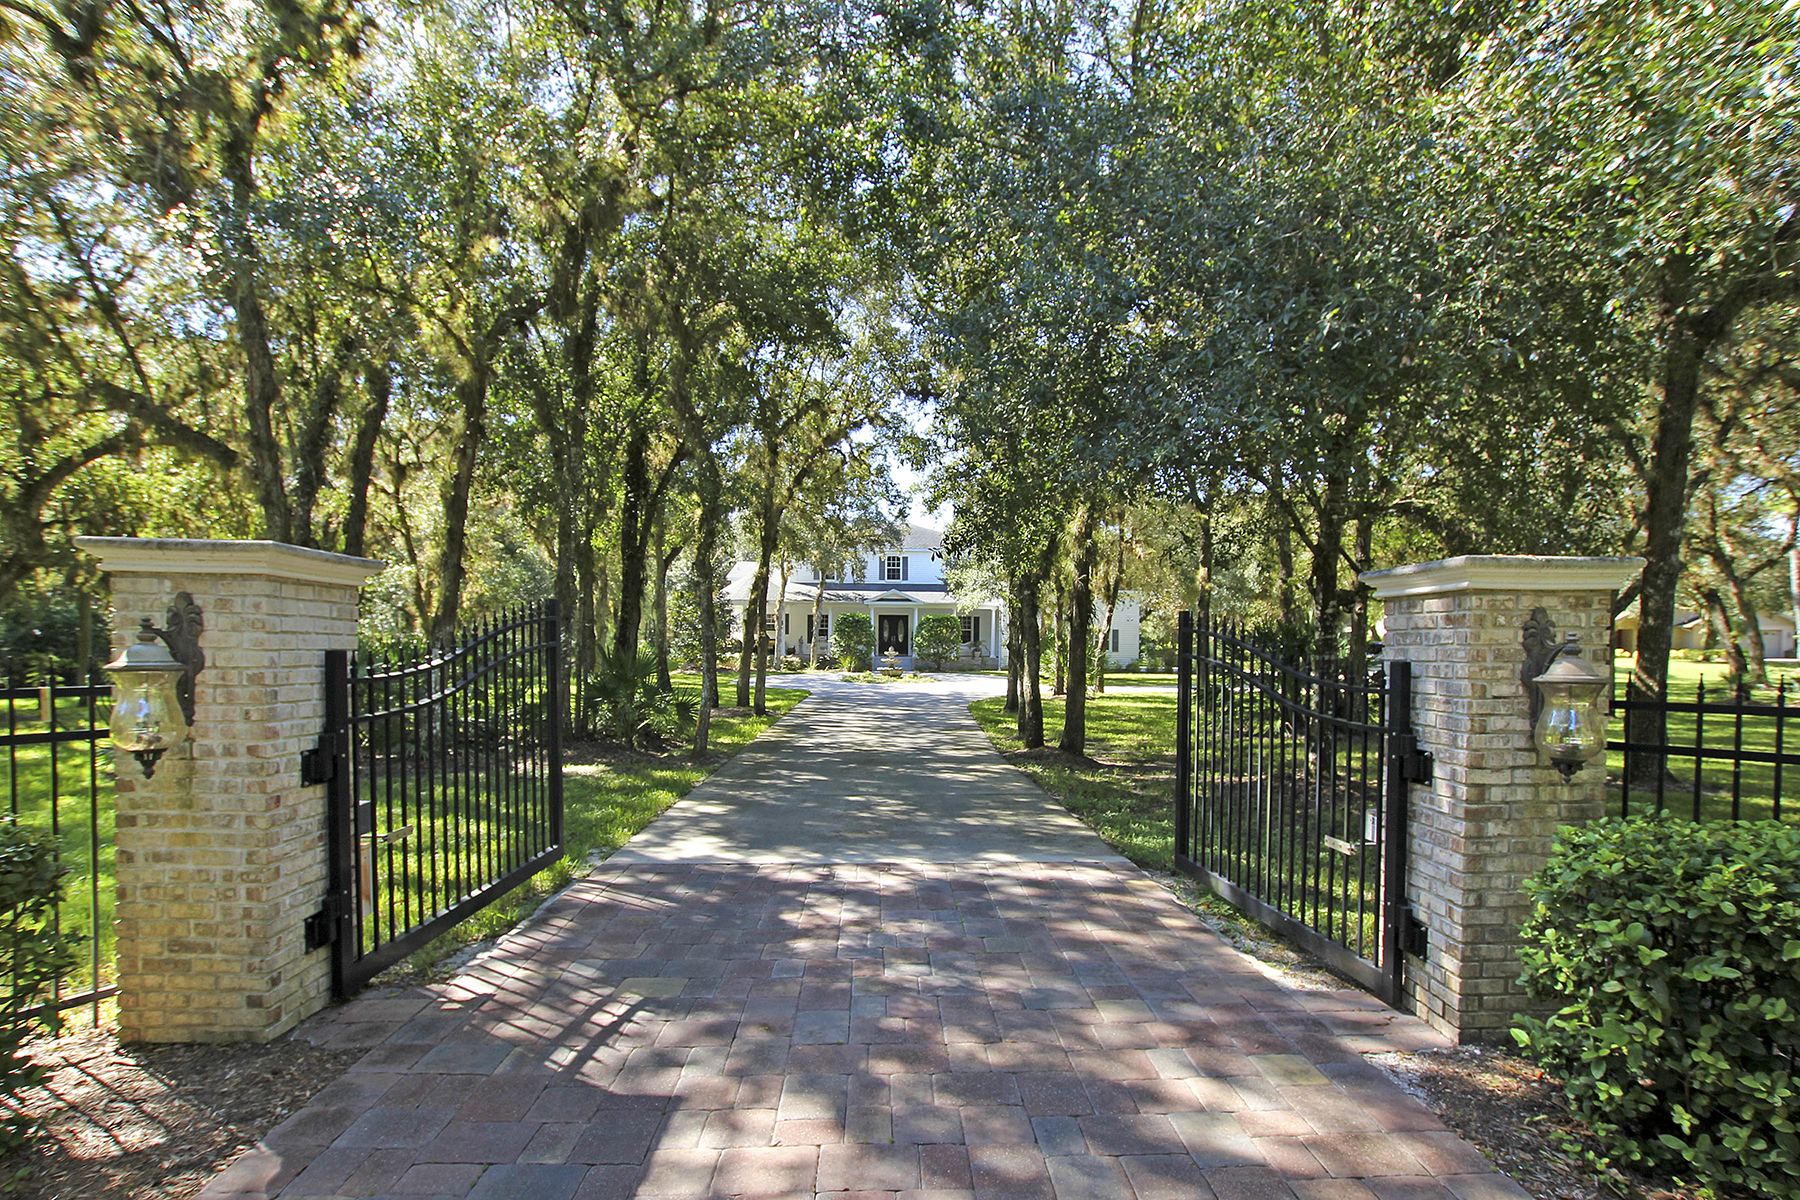 Single Family Home for Sale at ALVA 17280 Frank Rd, Alva, Florida 33920 United States